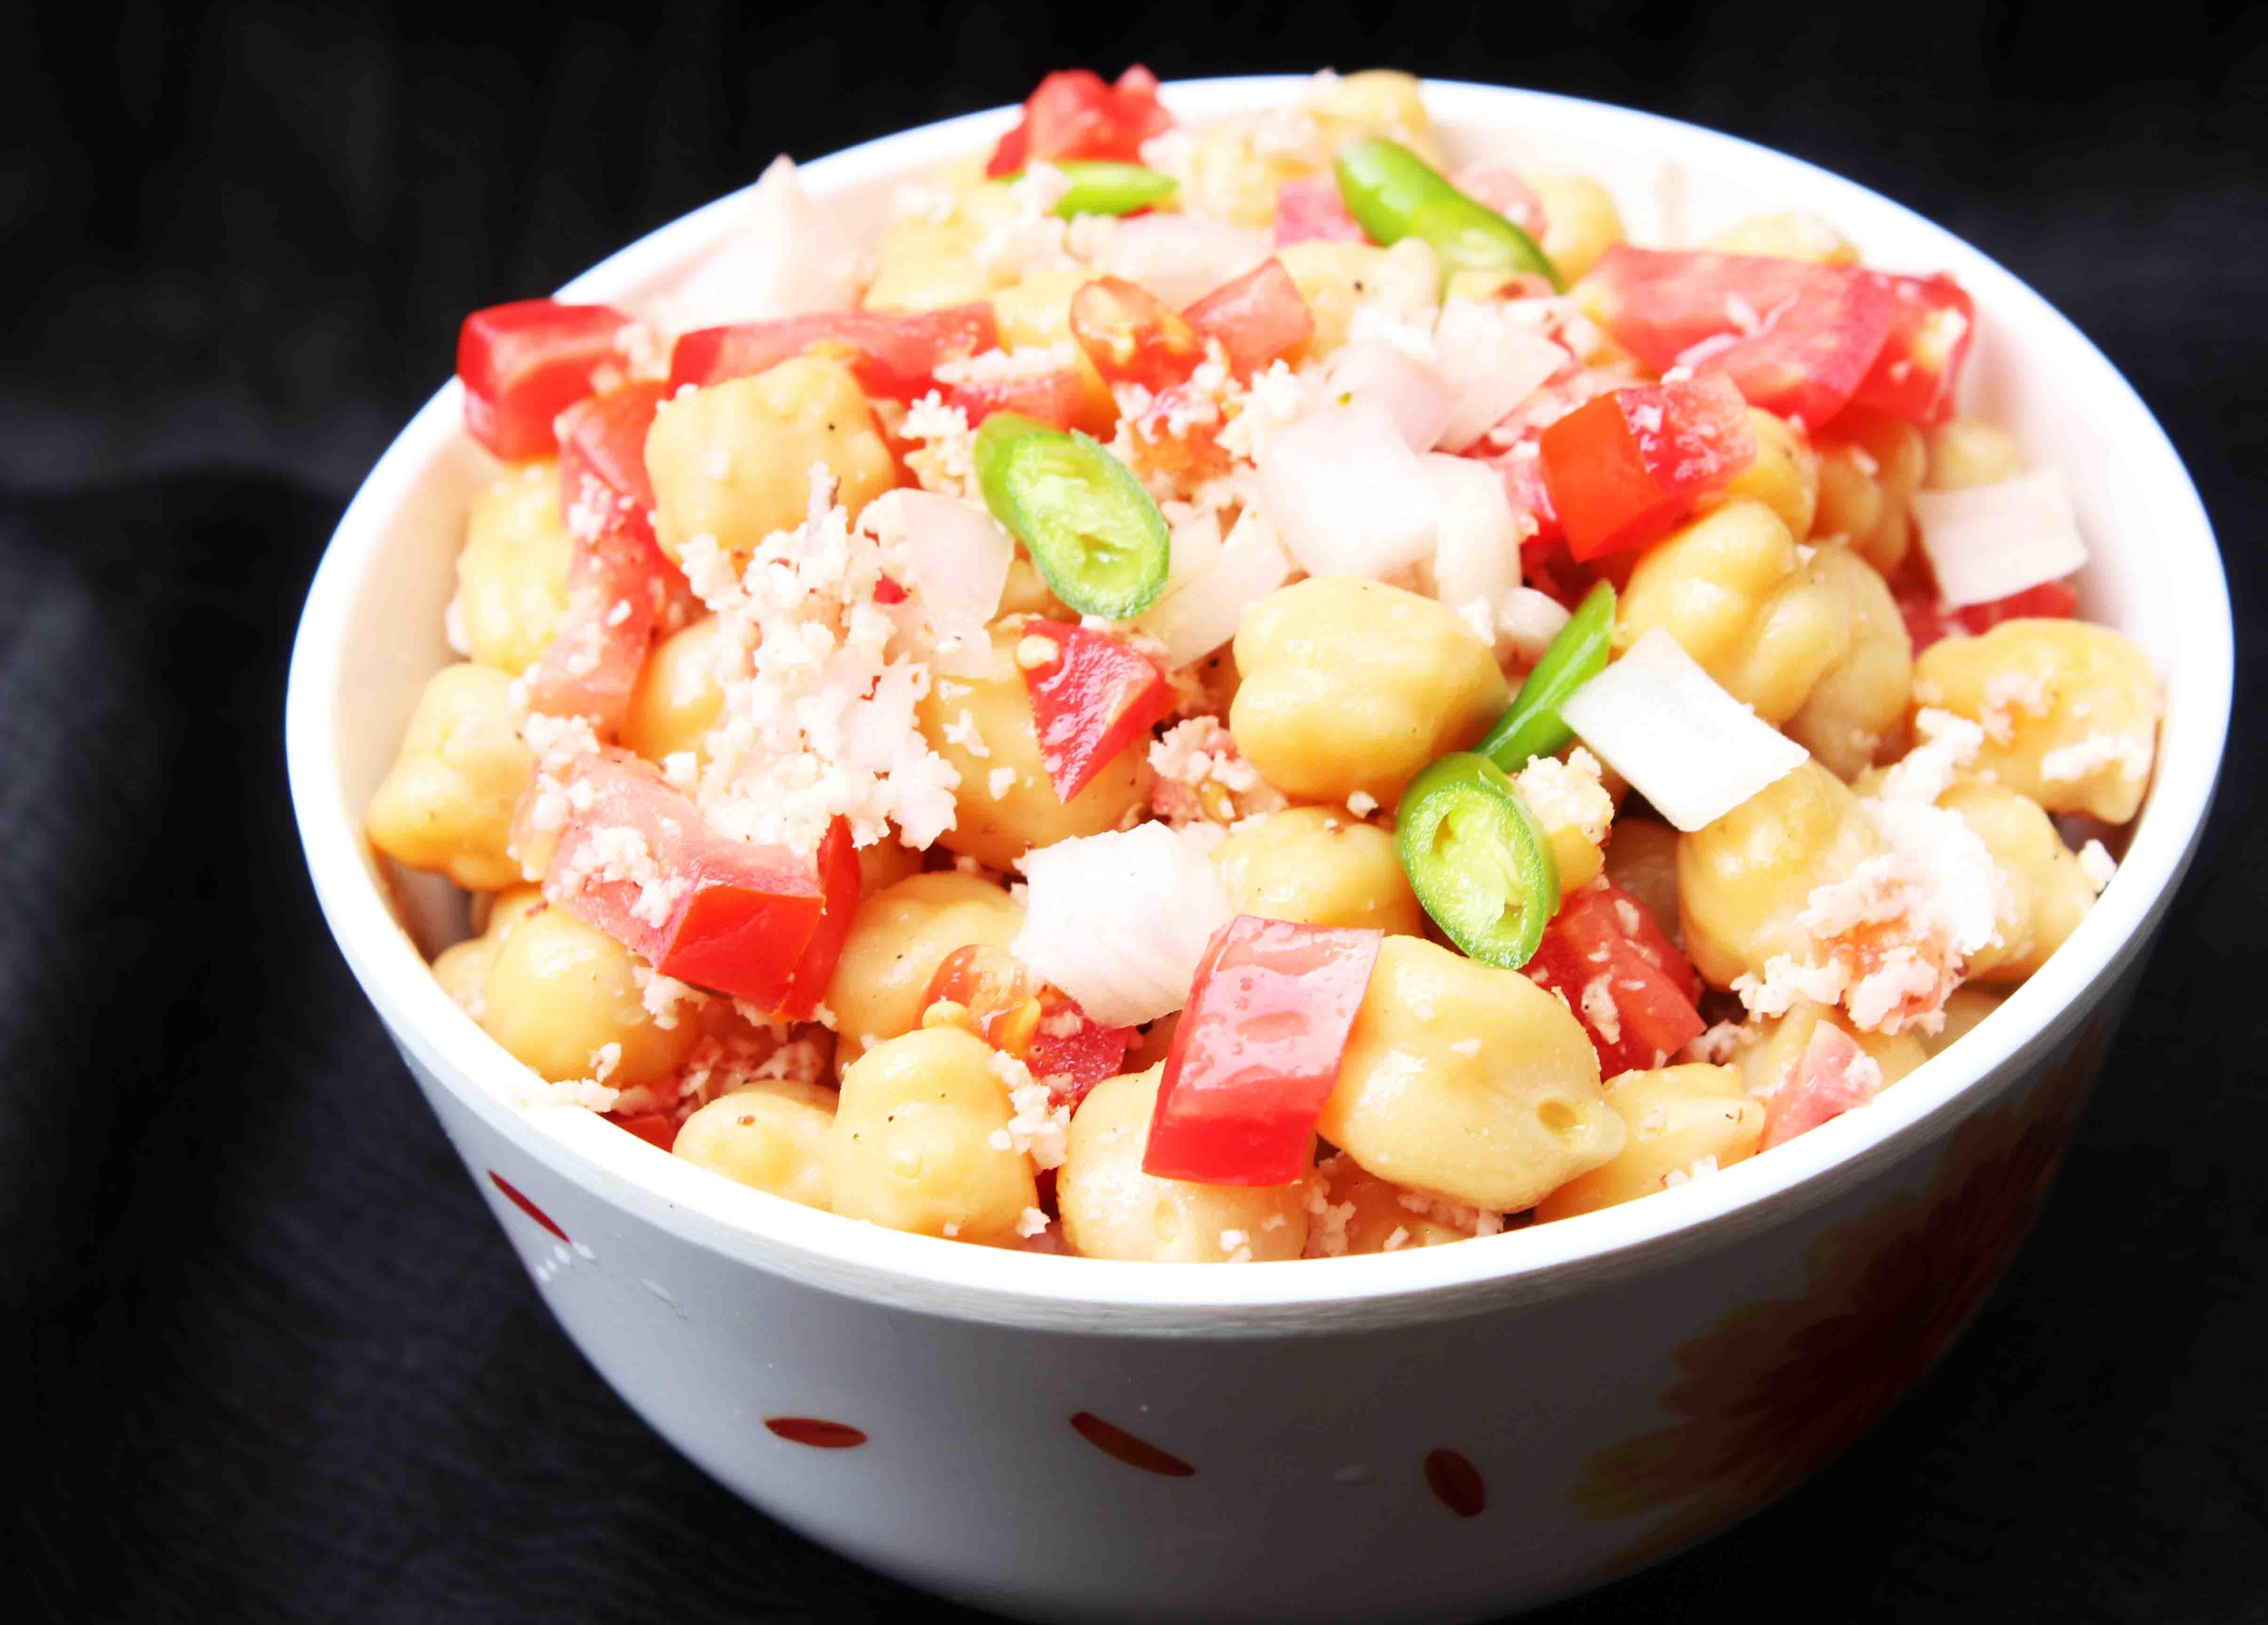 Kerala Style Spicy Chick Peas Salad Salt And Tamarind